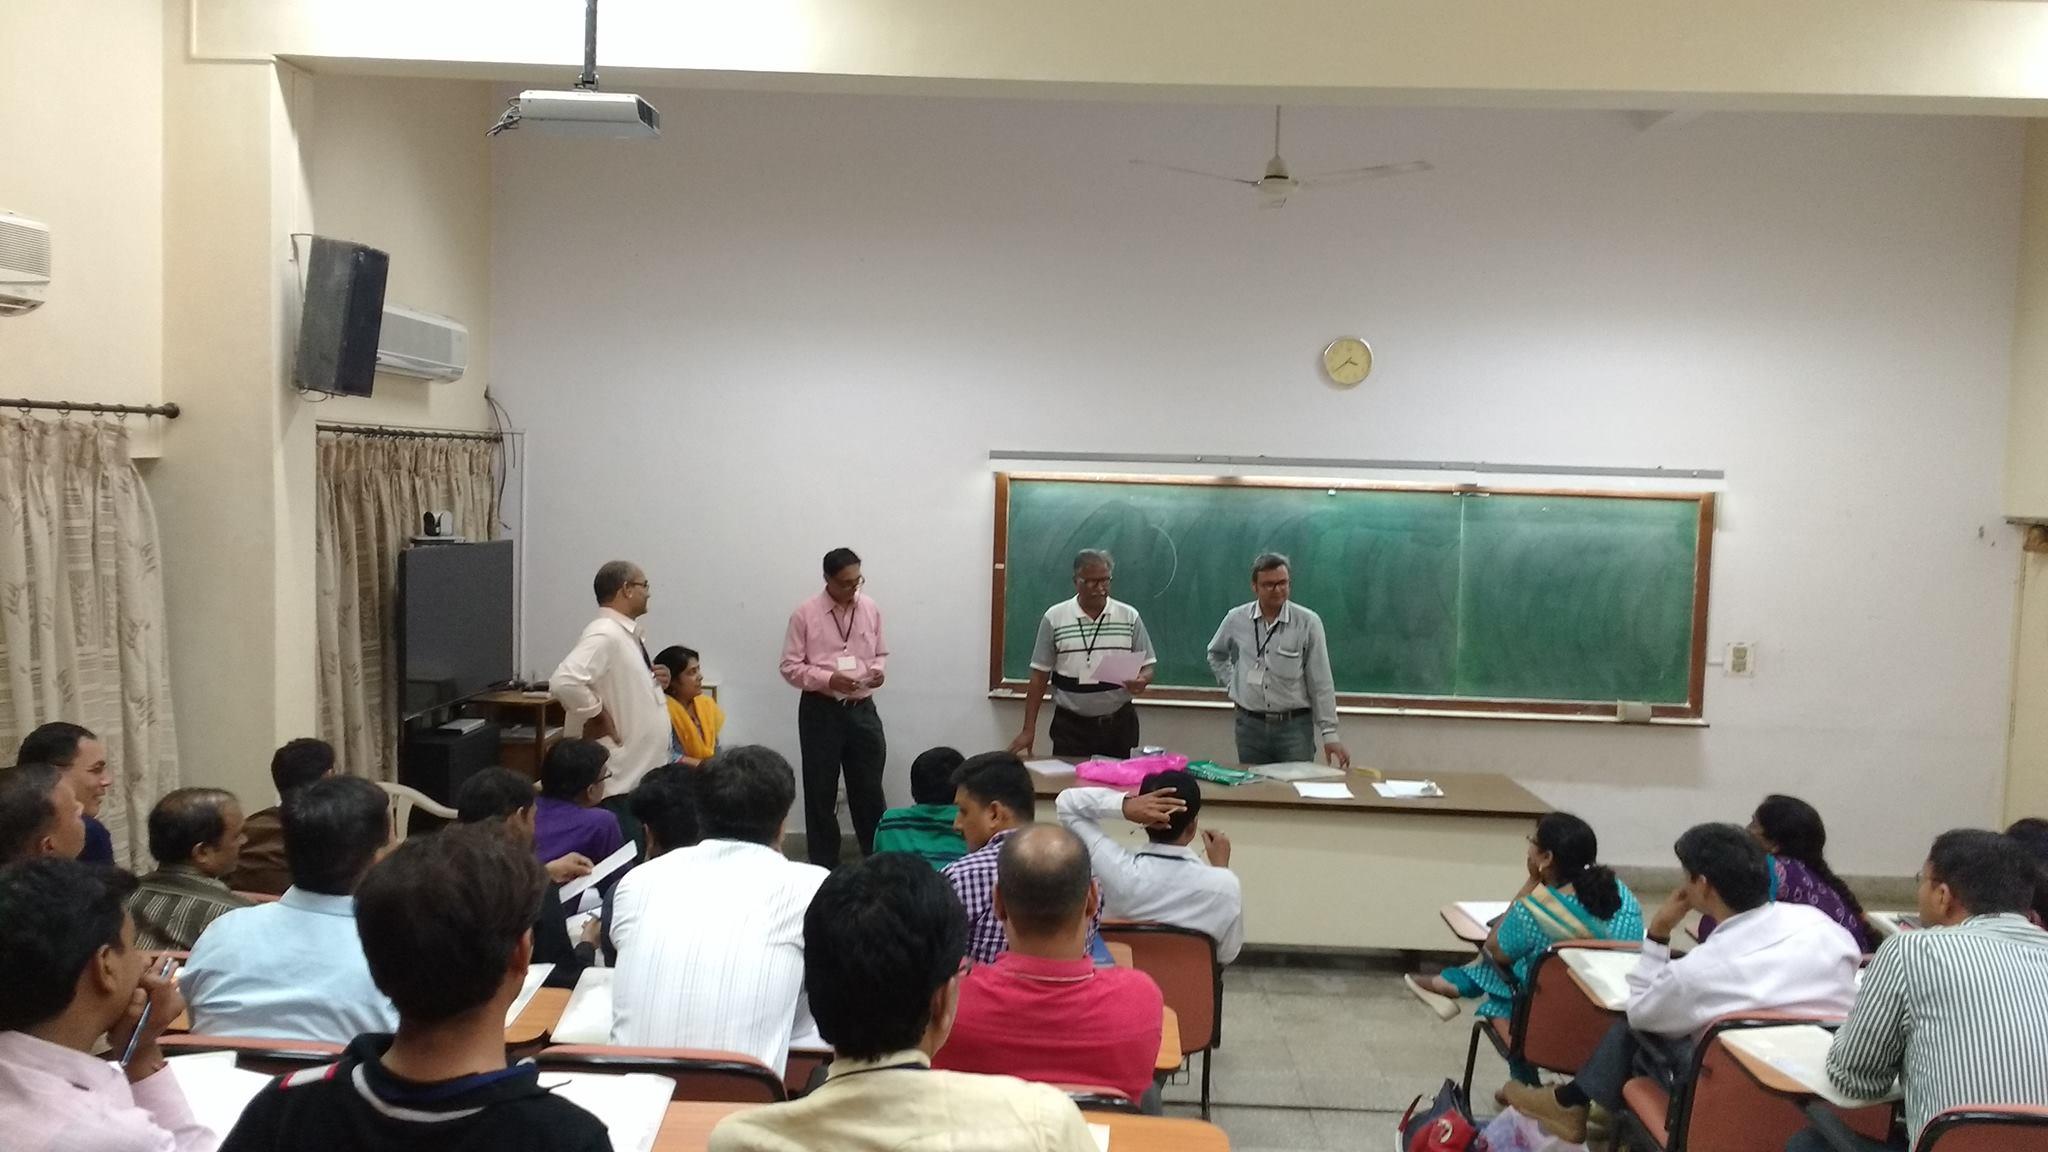 Teachers are presenting their ideas